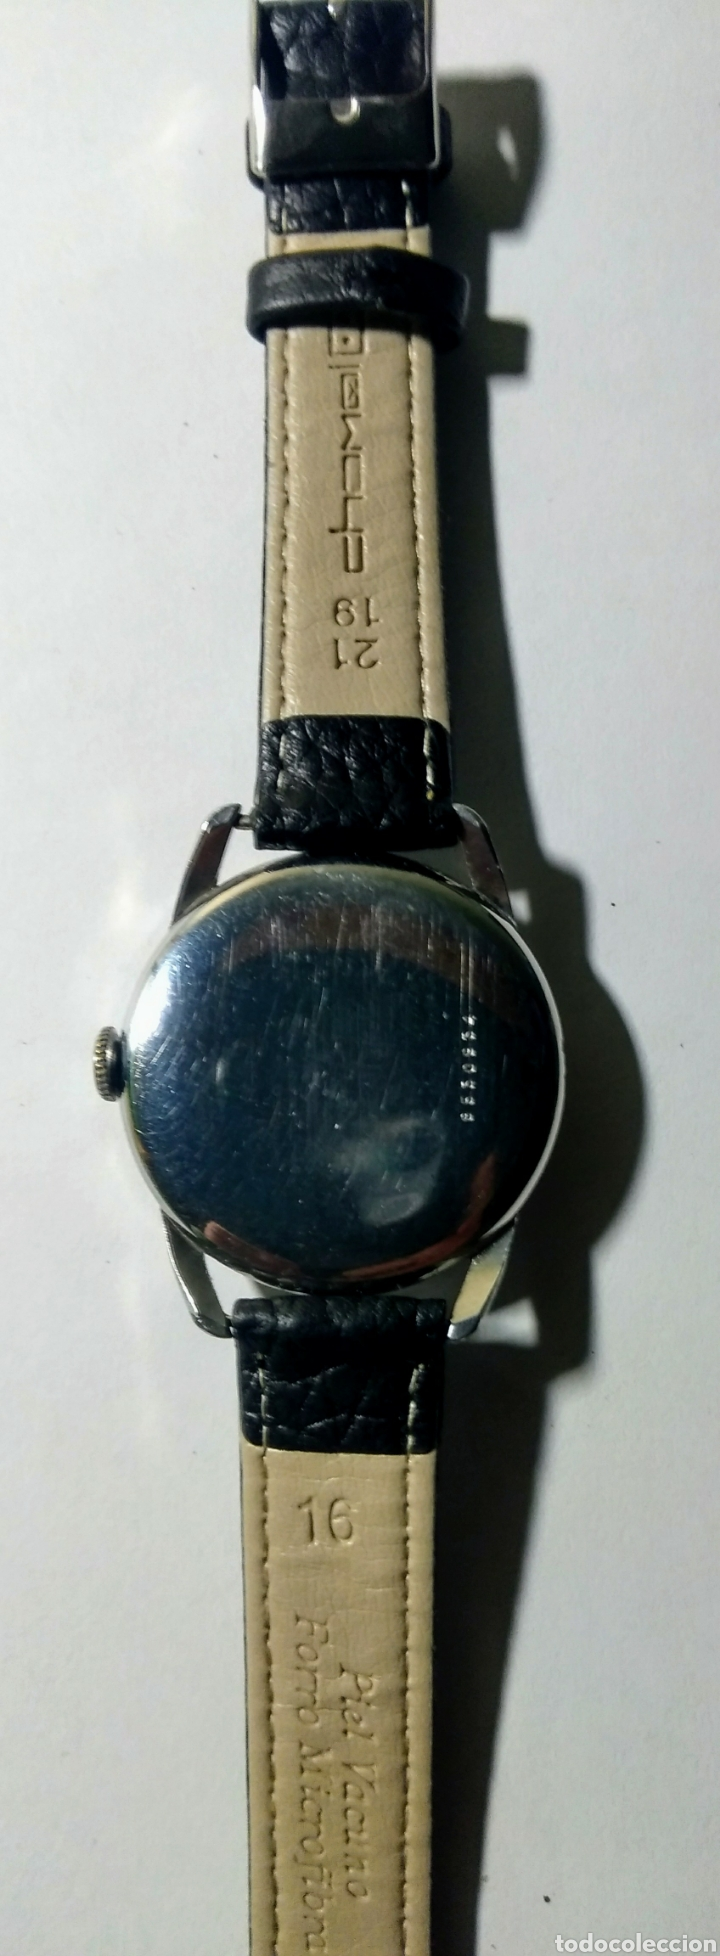 Relojes - Zenith: Reloj Zenith. Manual. Años 60. - Foto 4 - 188823935